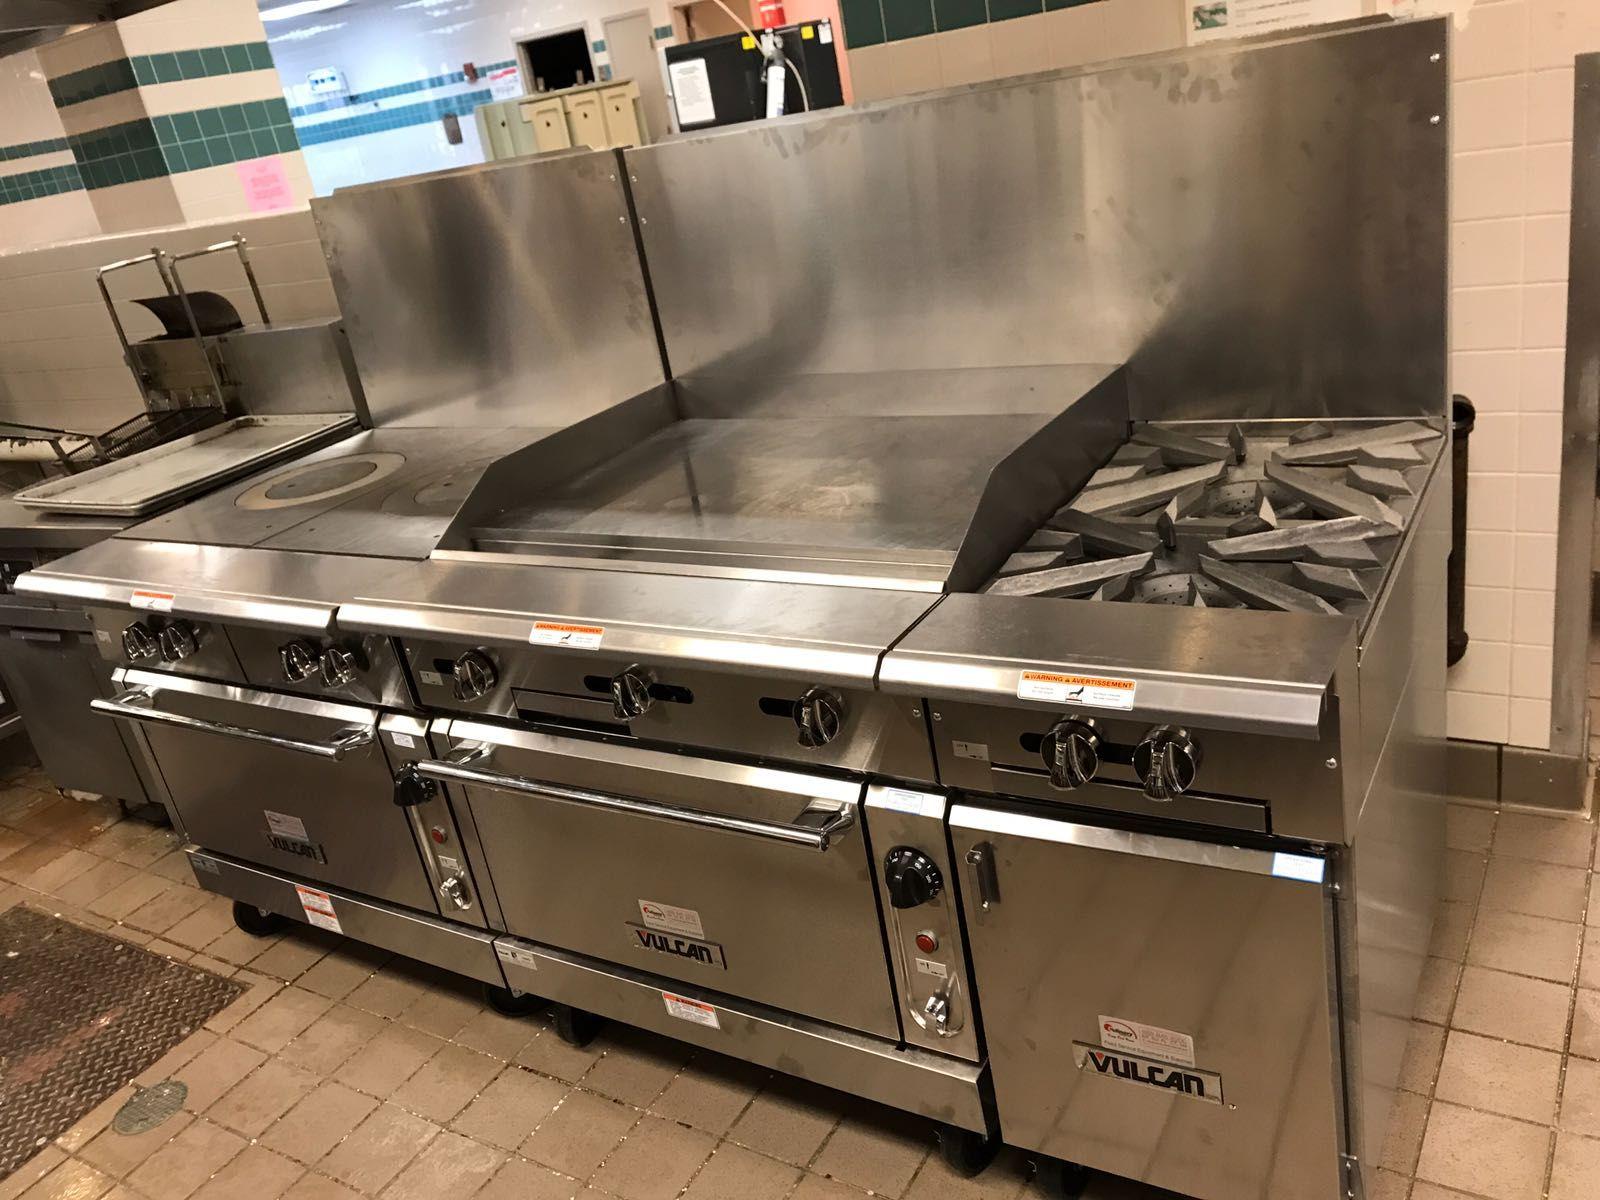 Some Vulcan Commercial Kitchen Equipment Https Www